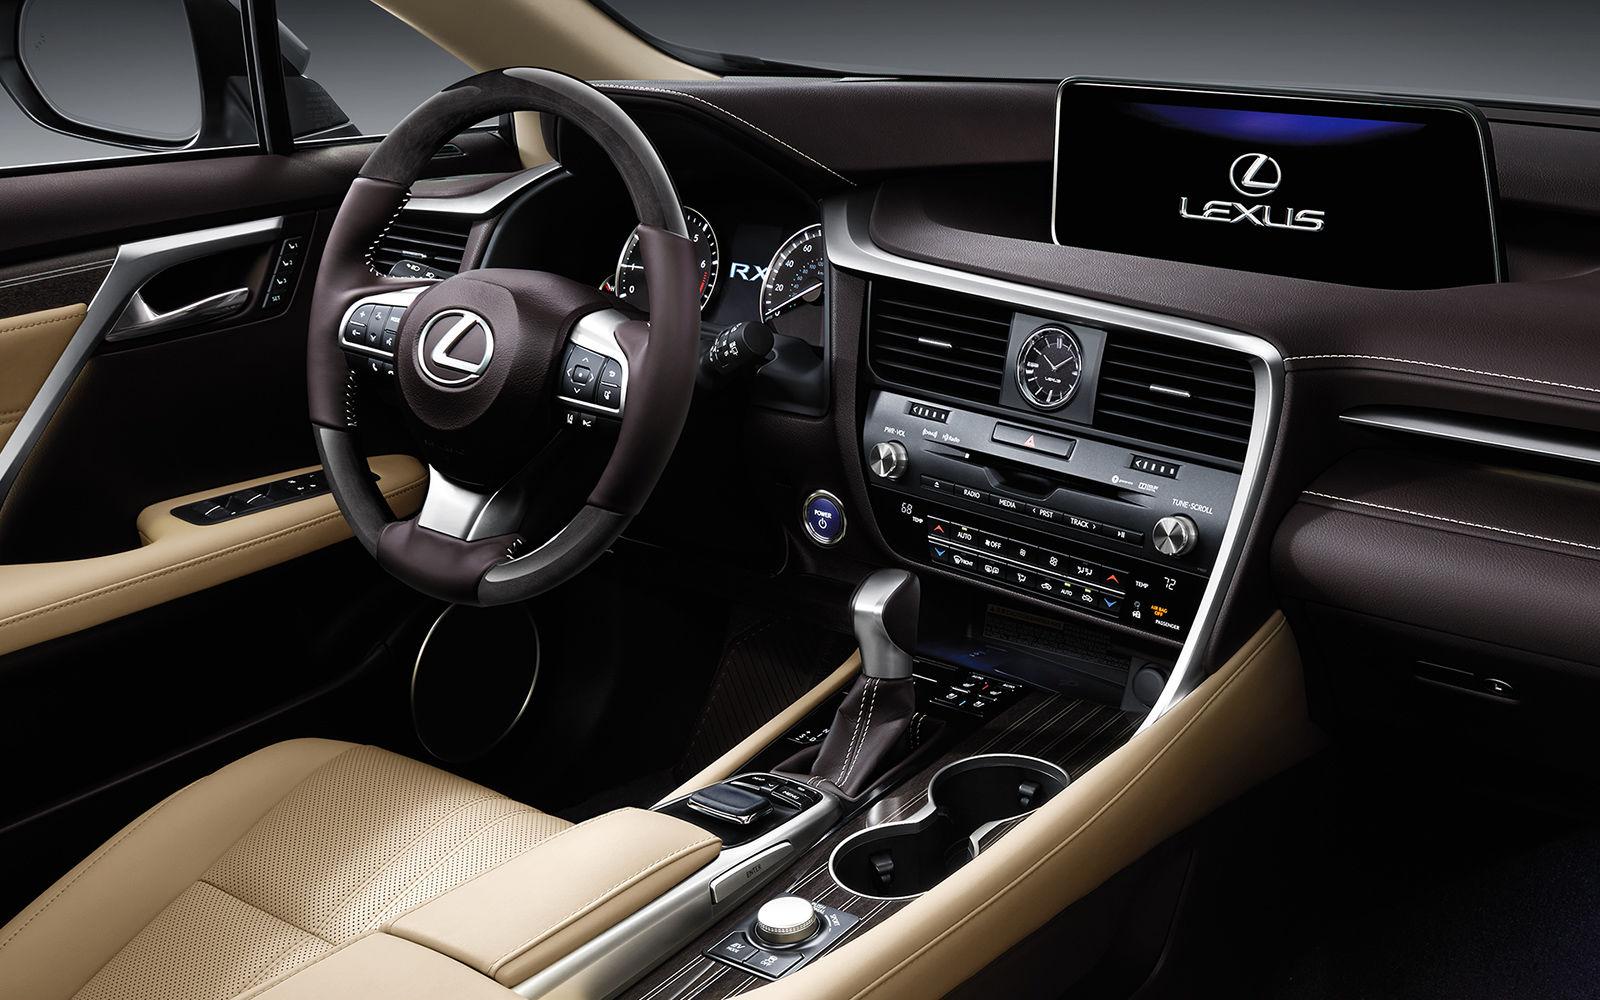 2018 Lexus Rx Hybrid Fuel Efficiency In Style By Lexus Of